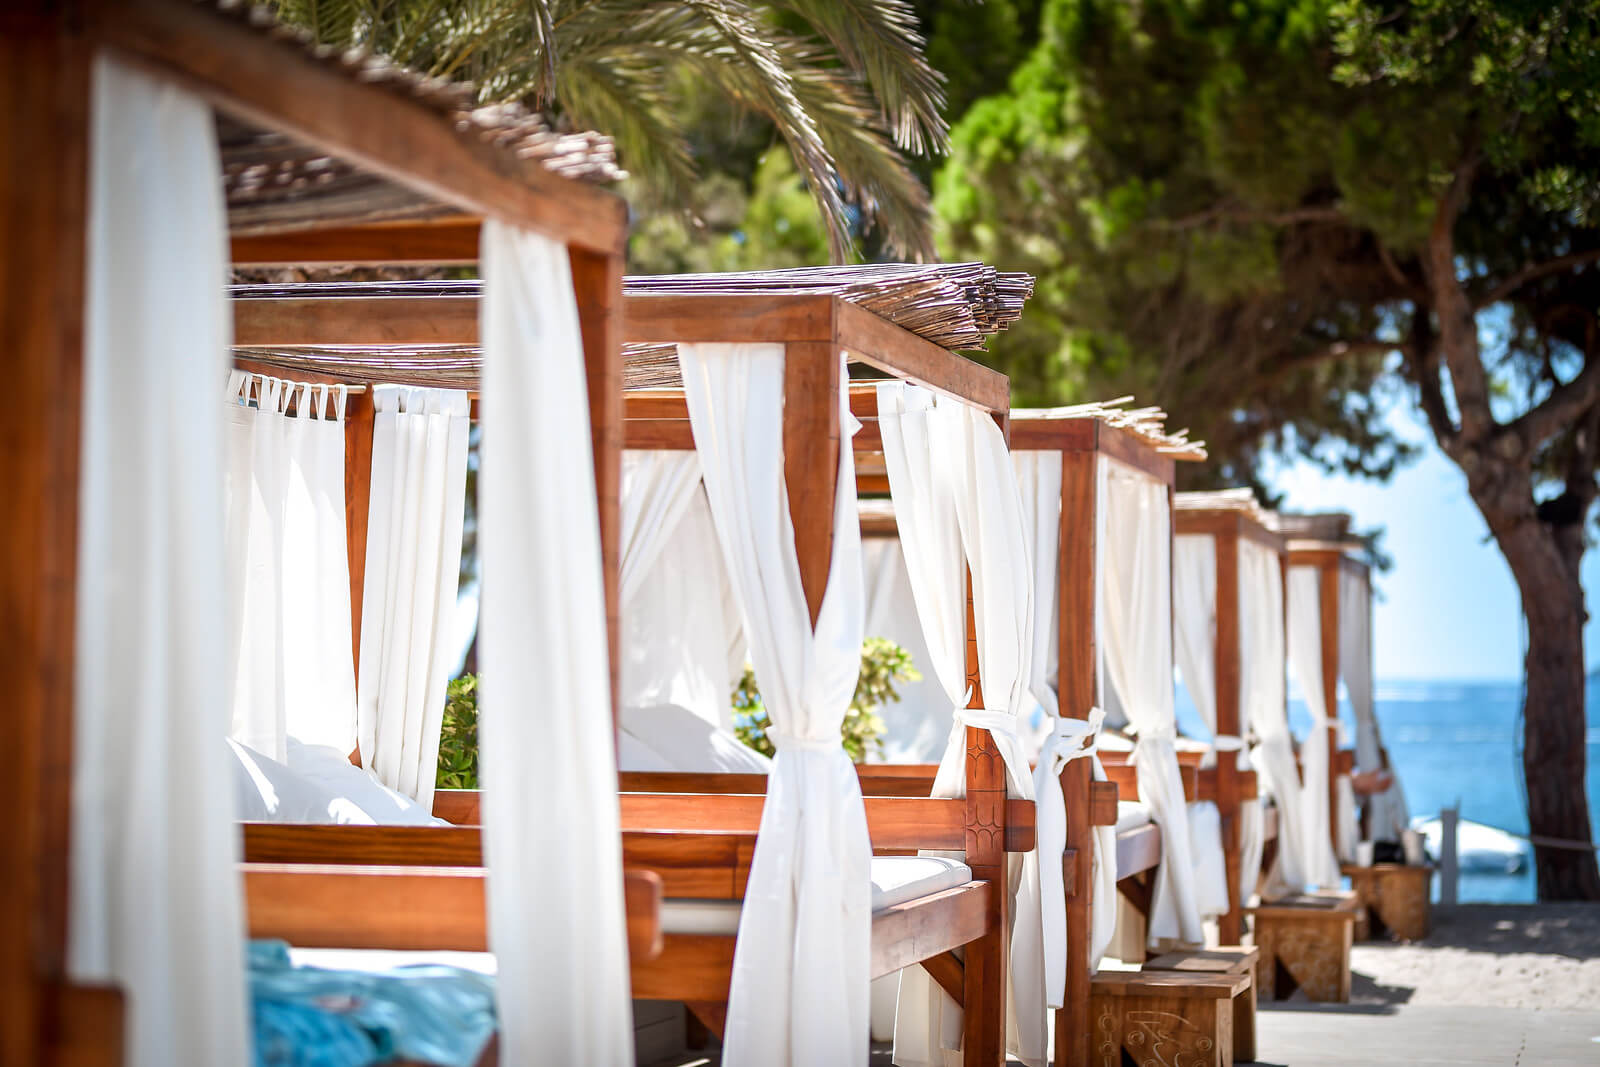 https://www.white-ibiza.com/wp-content/uploads/2020/03/white-ibiza-restaurants-nikki-beach-ibiza-2020-03.jpg